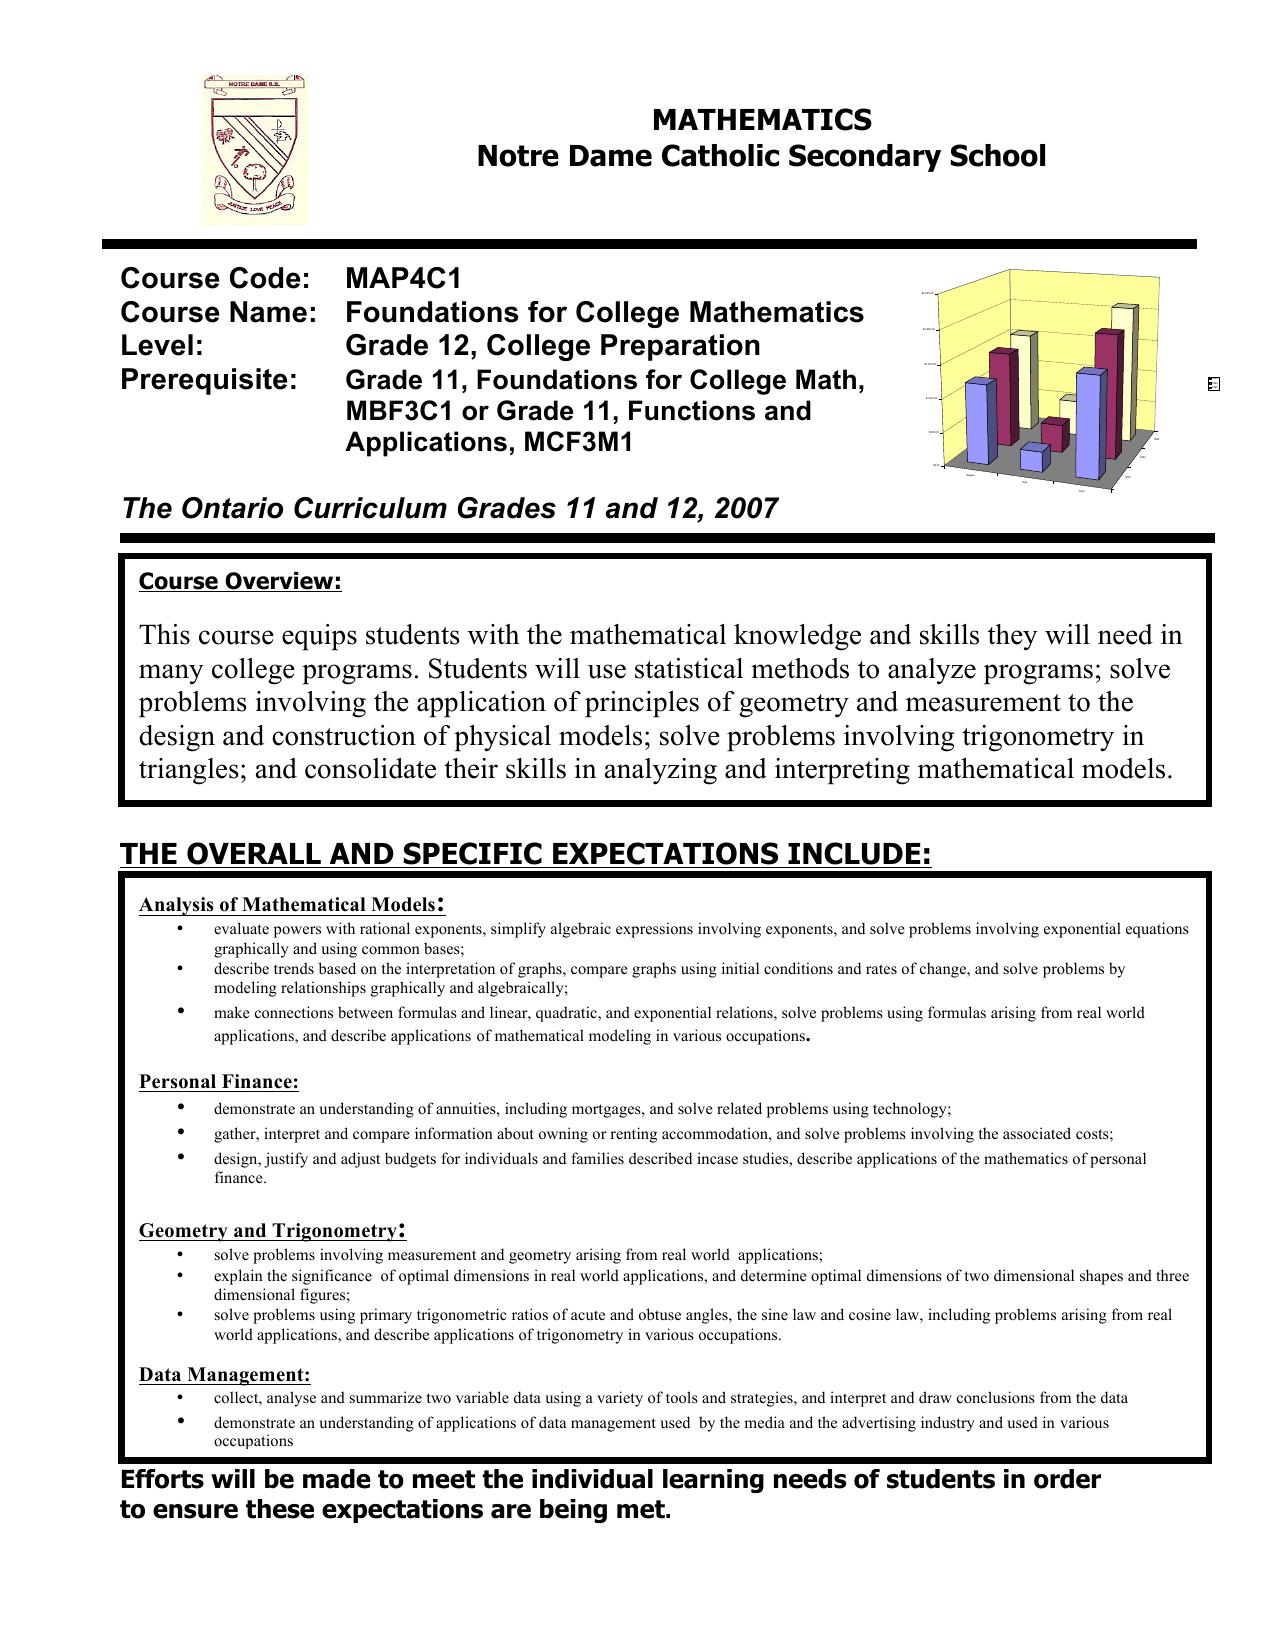 MATHEMATICS Notre Dame Catholic Secondary School Course Code: MAP4C1